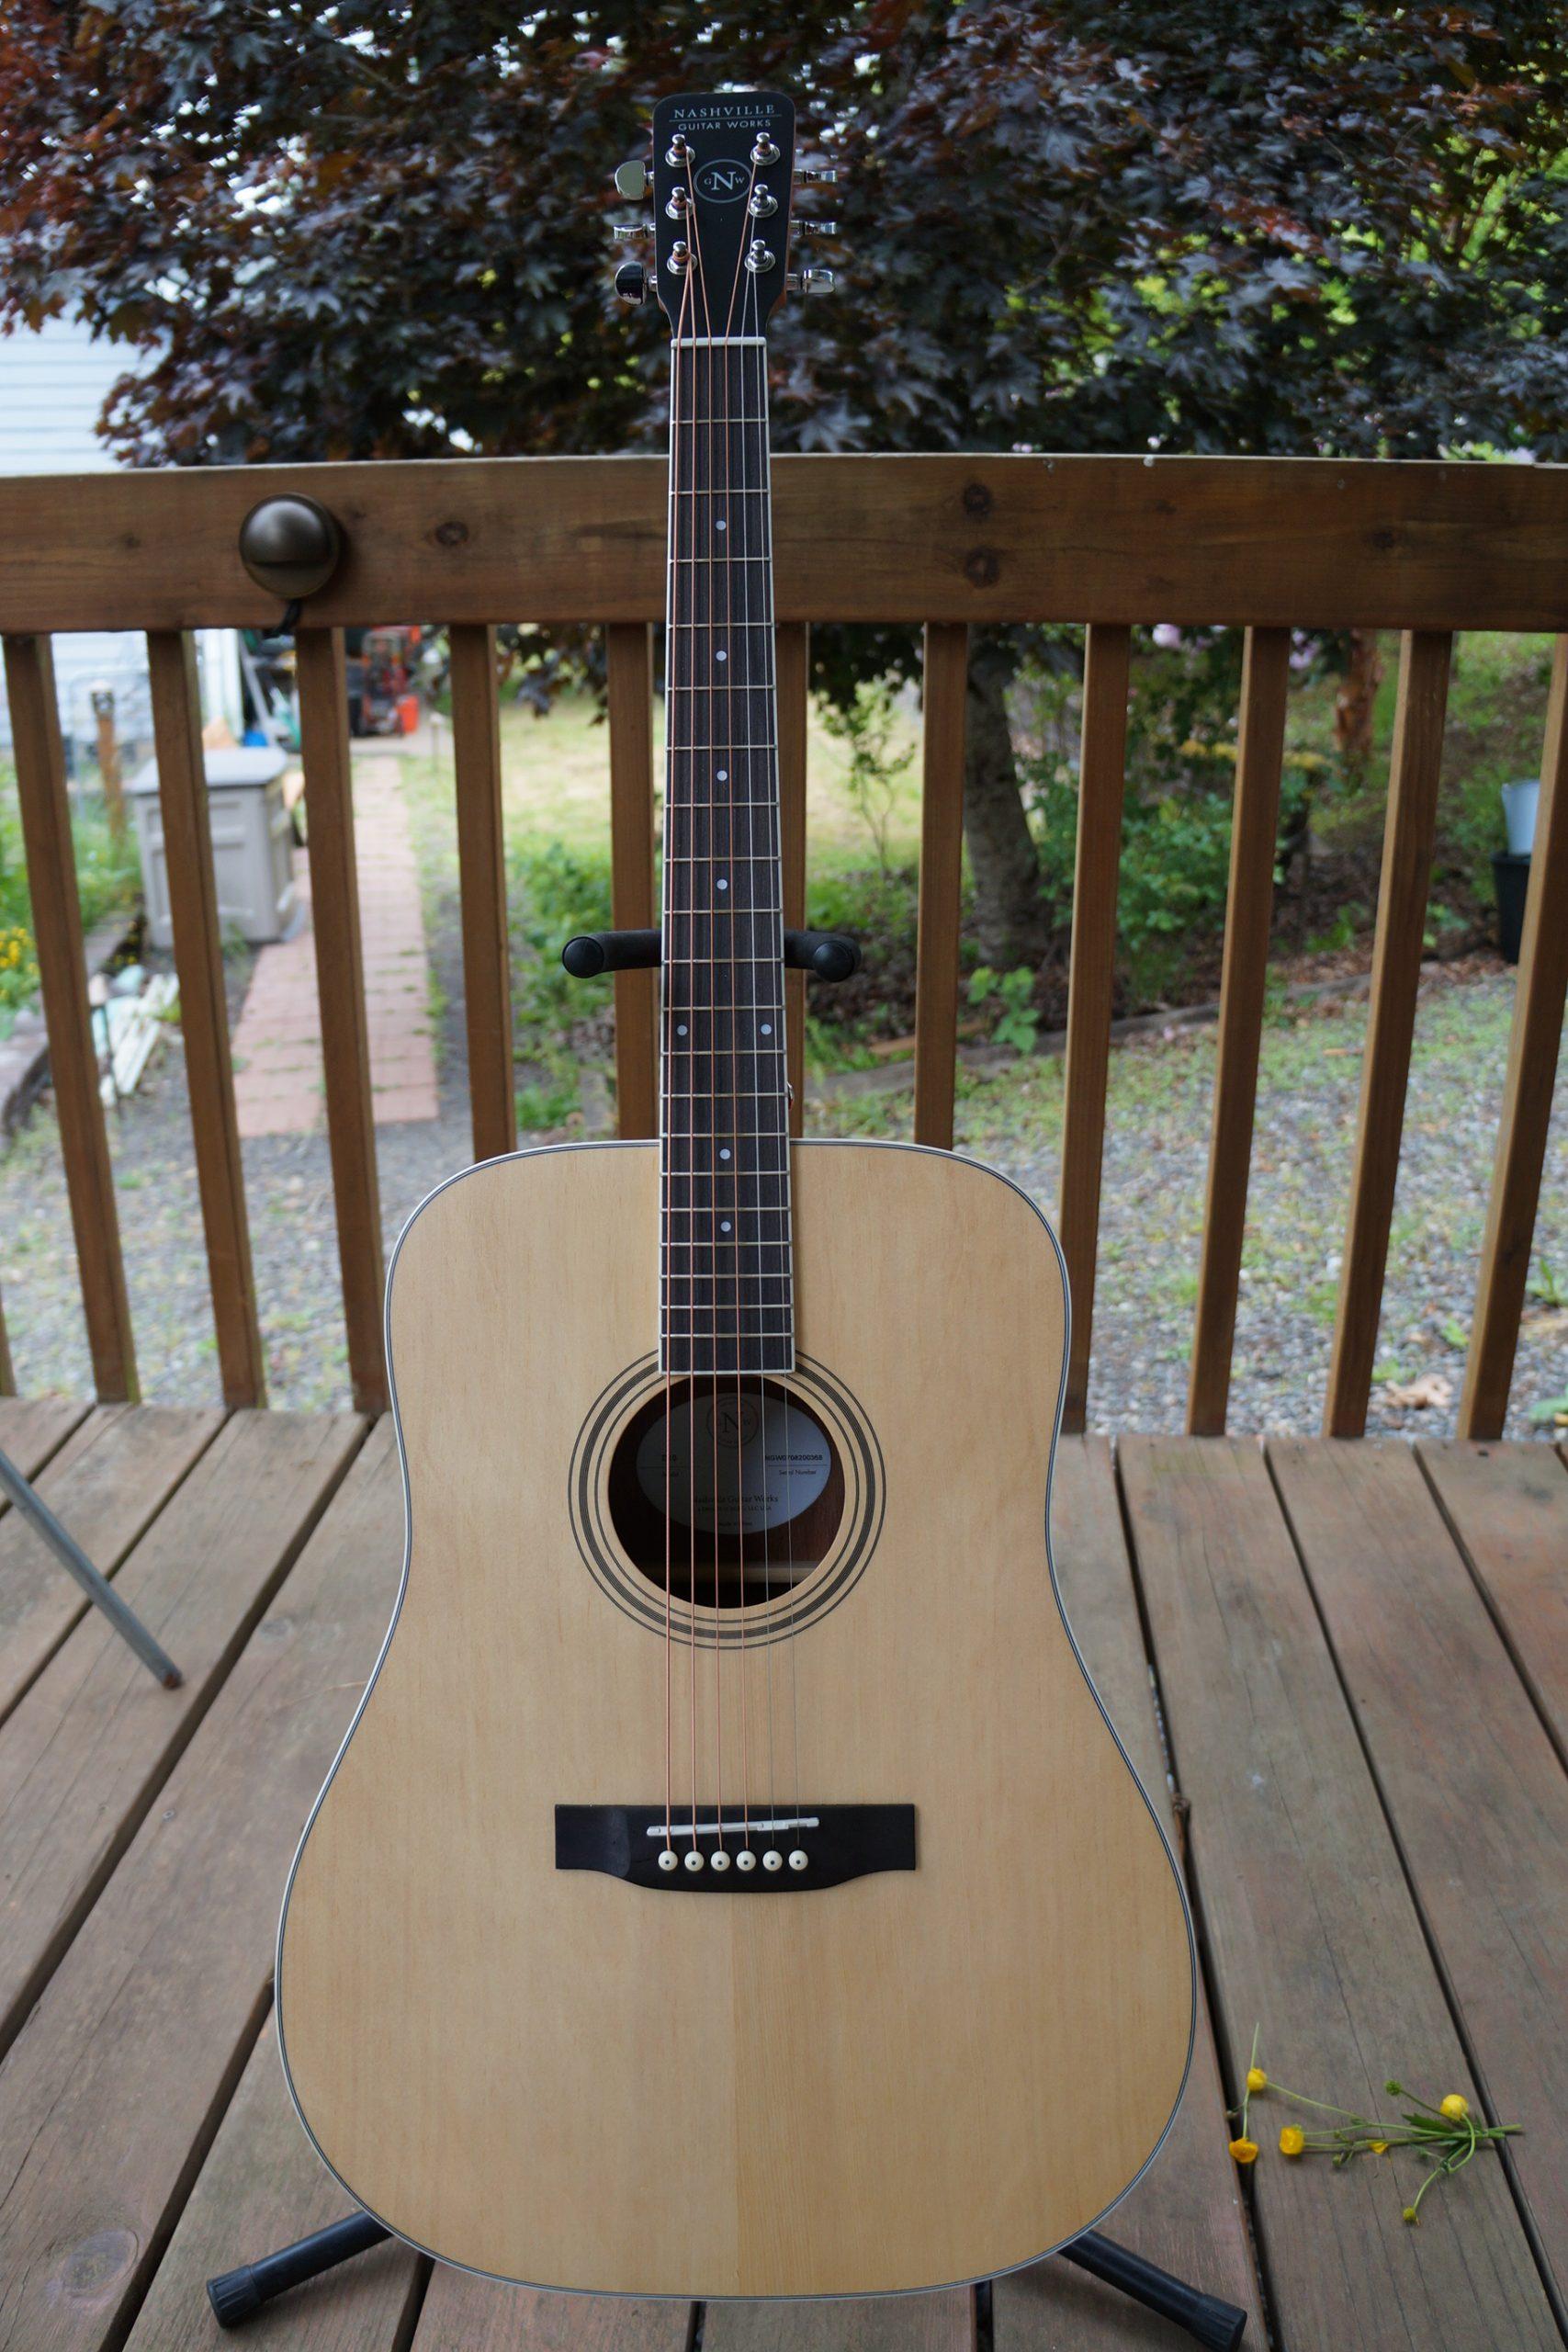 Nashville Guitar Works Orchestra Acoustic: Natural Satin Finish (NEW) w/Bag